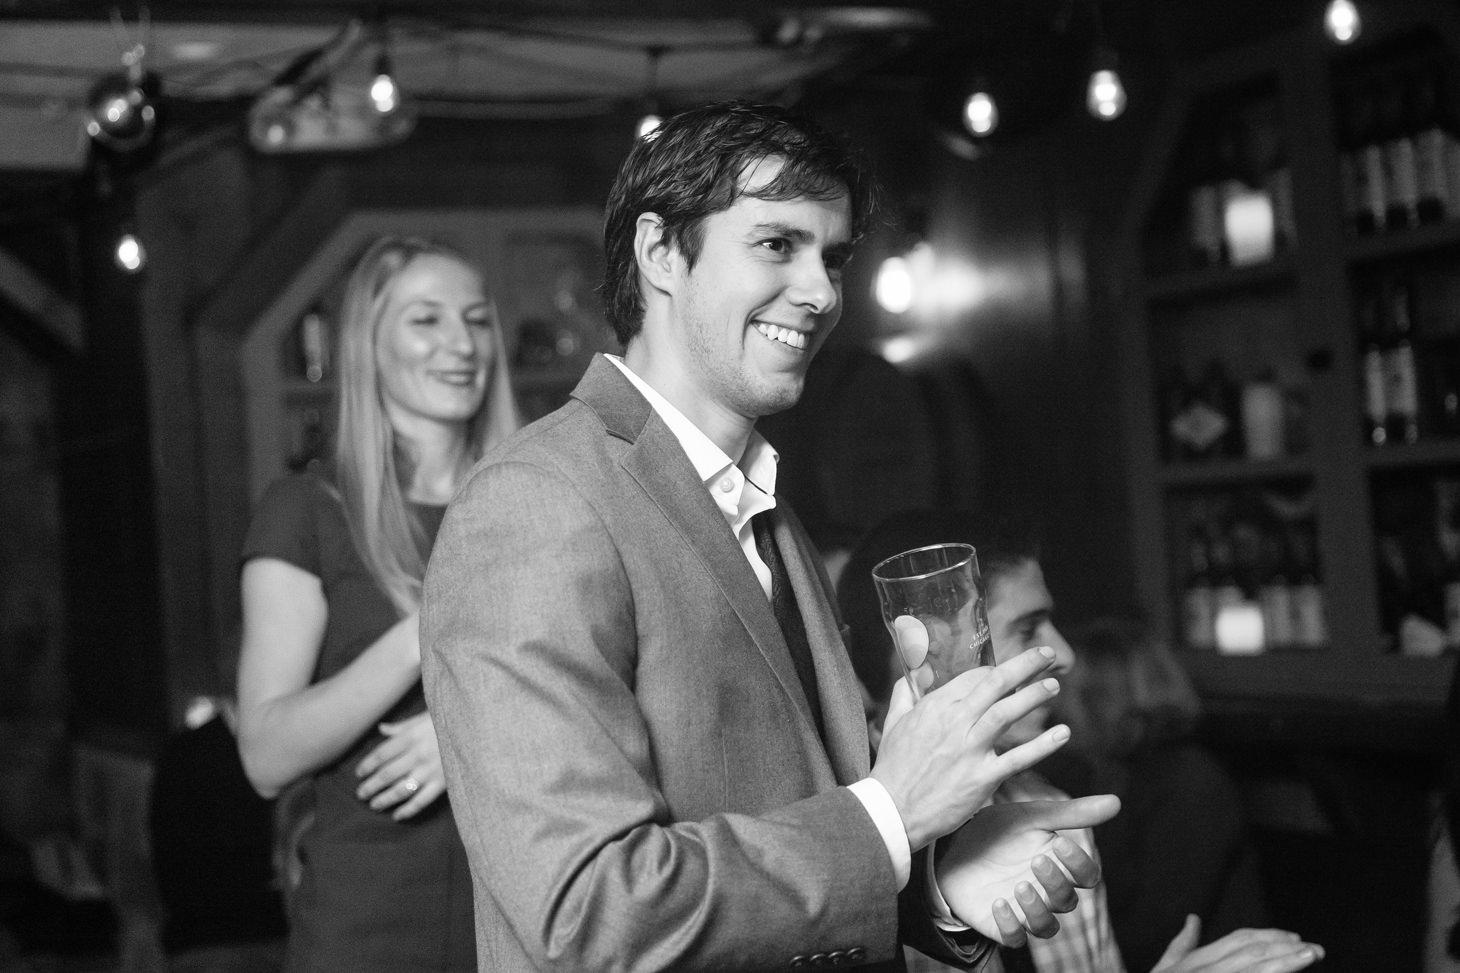 031-NYC-Intimate-Wedding-photography-SmittenChickens-city-hall-lauren-aaron.jpg